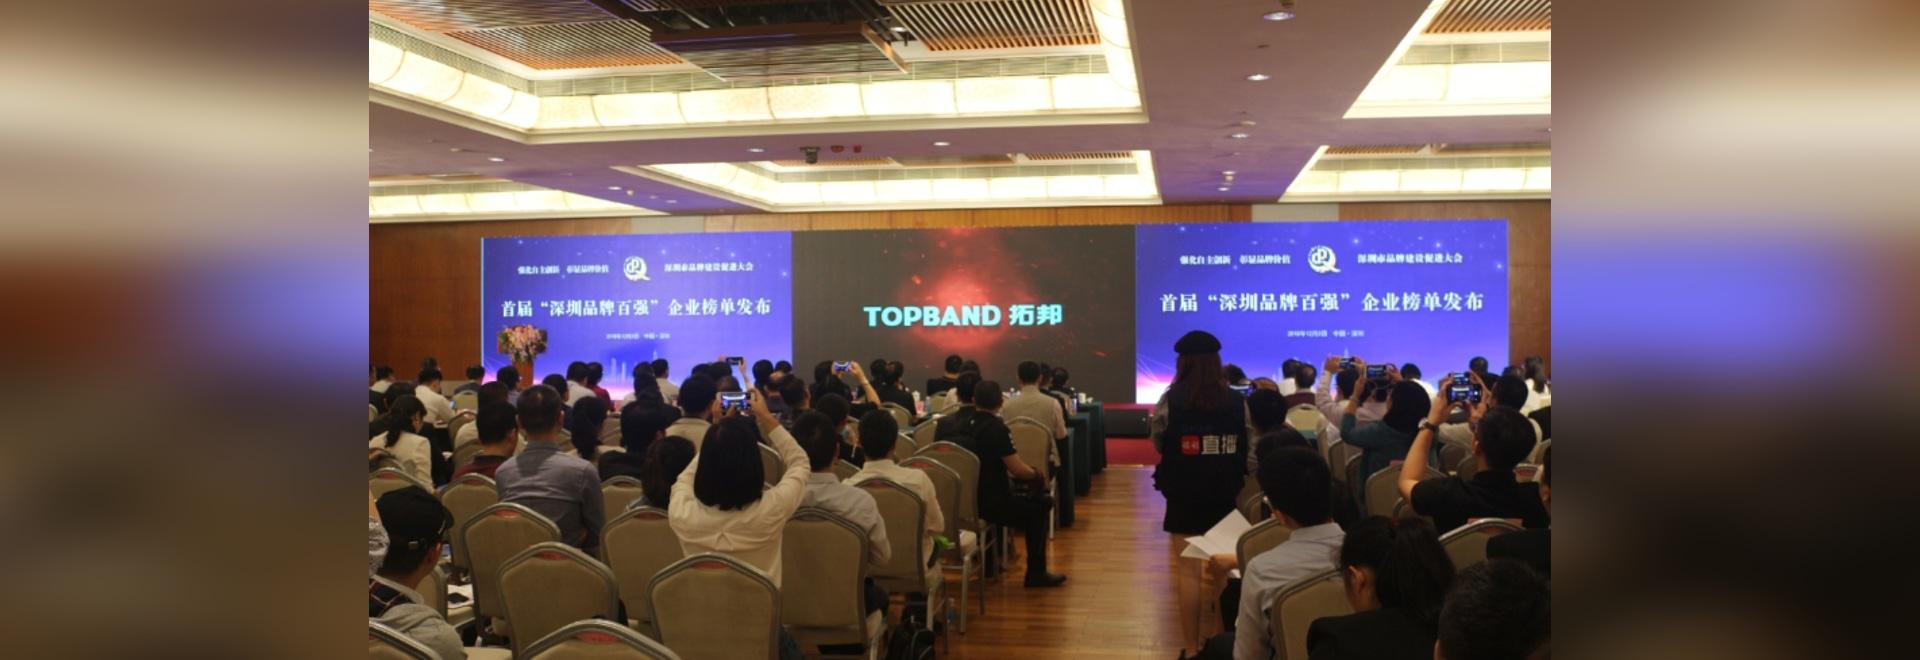 Shenzhen Topband Cie., Ltd a attribué des 100 marques principales à Shenzhen